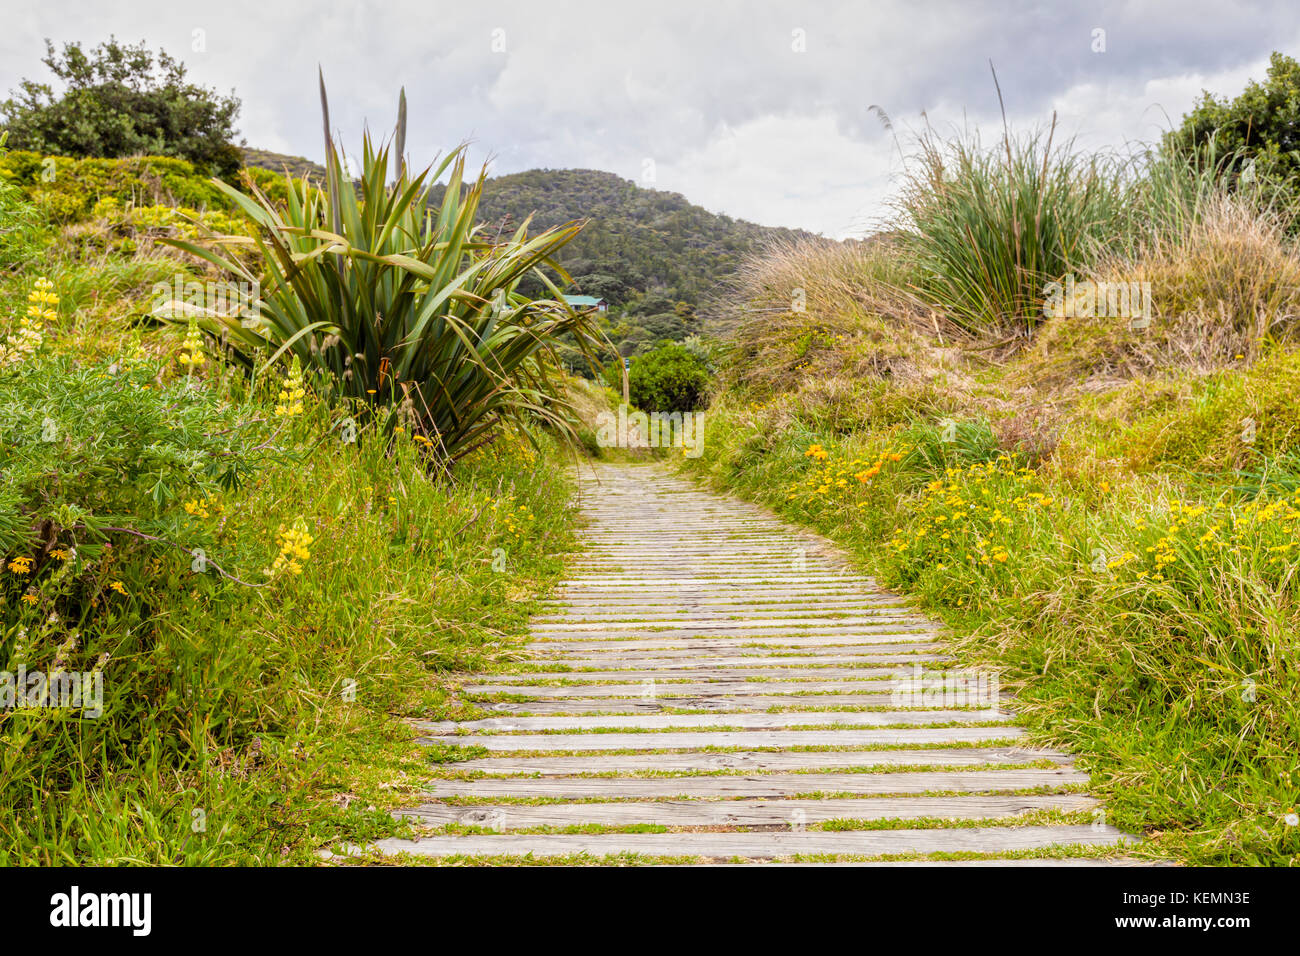 Boardwalk through vegetation covered sand dunes, Piha, Auckland, New Zealand, on a soft light day. - Stock Image